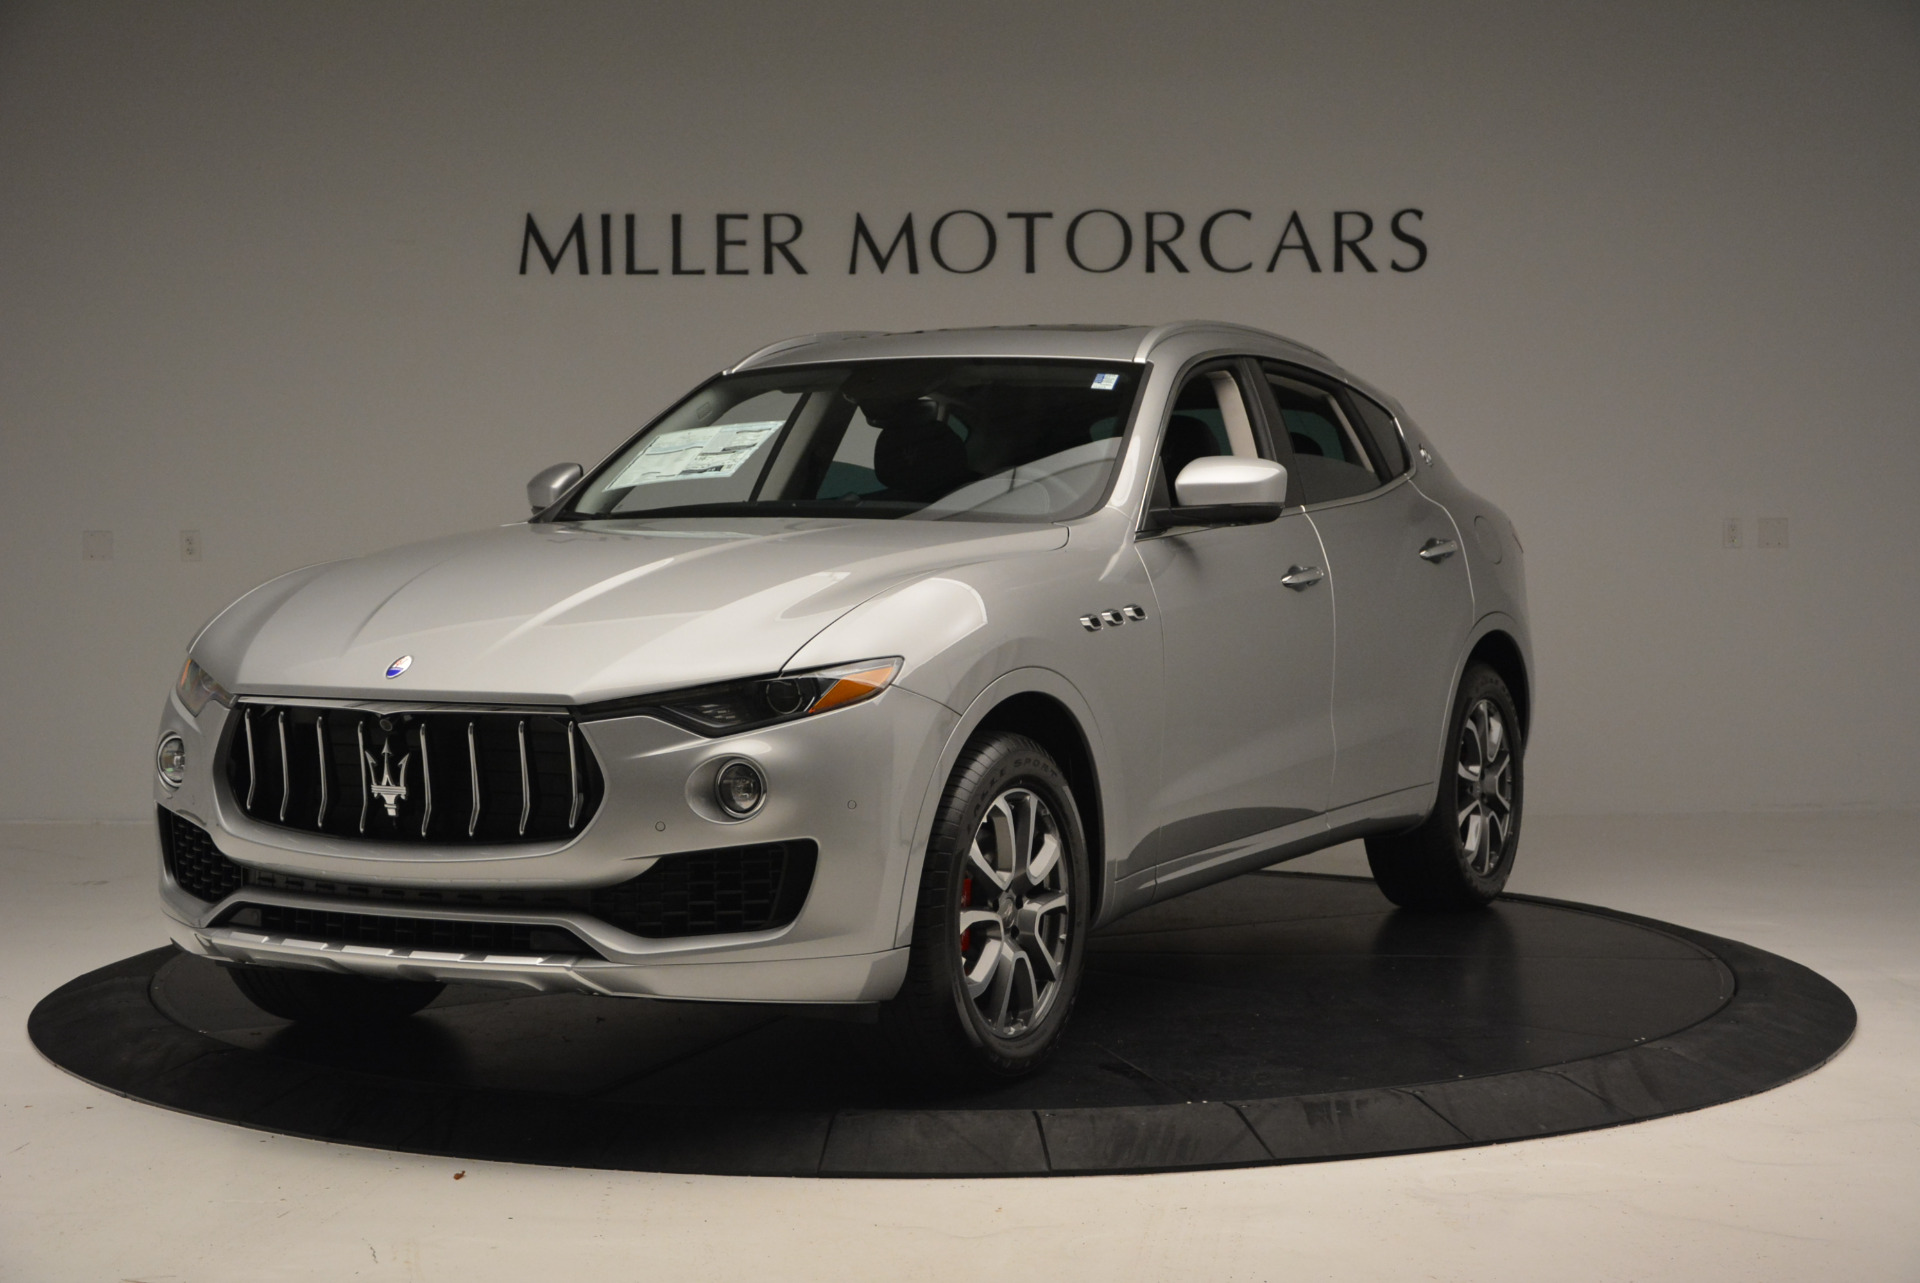 New 2017 Maserati Levante 350hp for sale Sold at McLaren Greenwich in Greenwich CT 06830 1